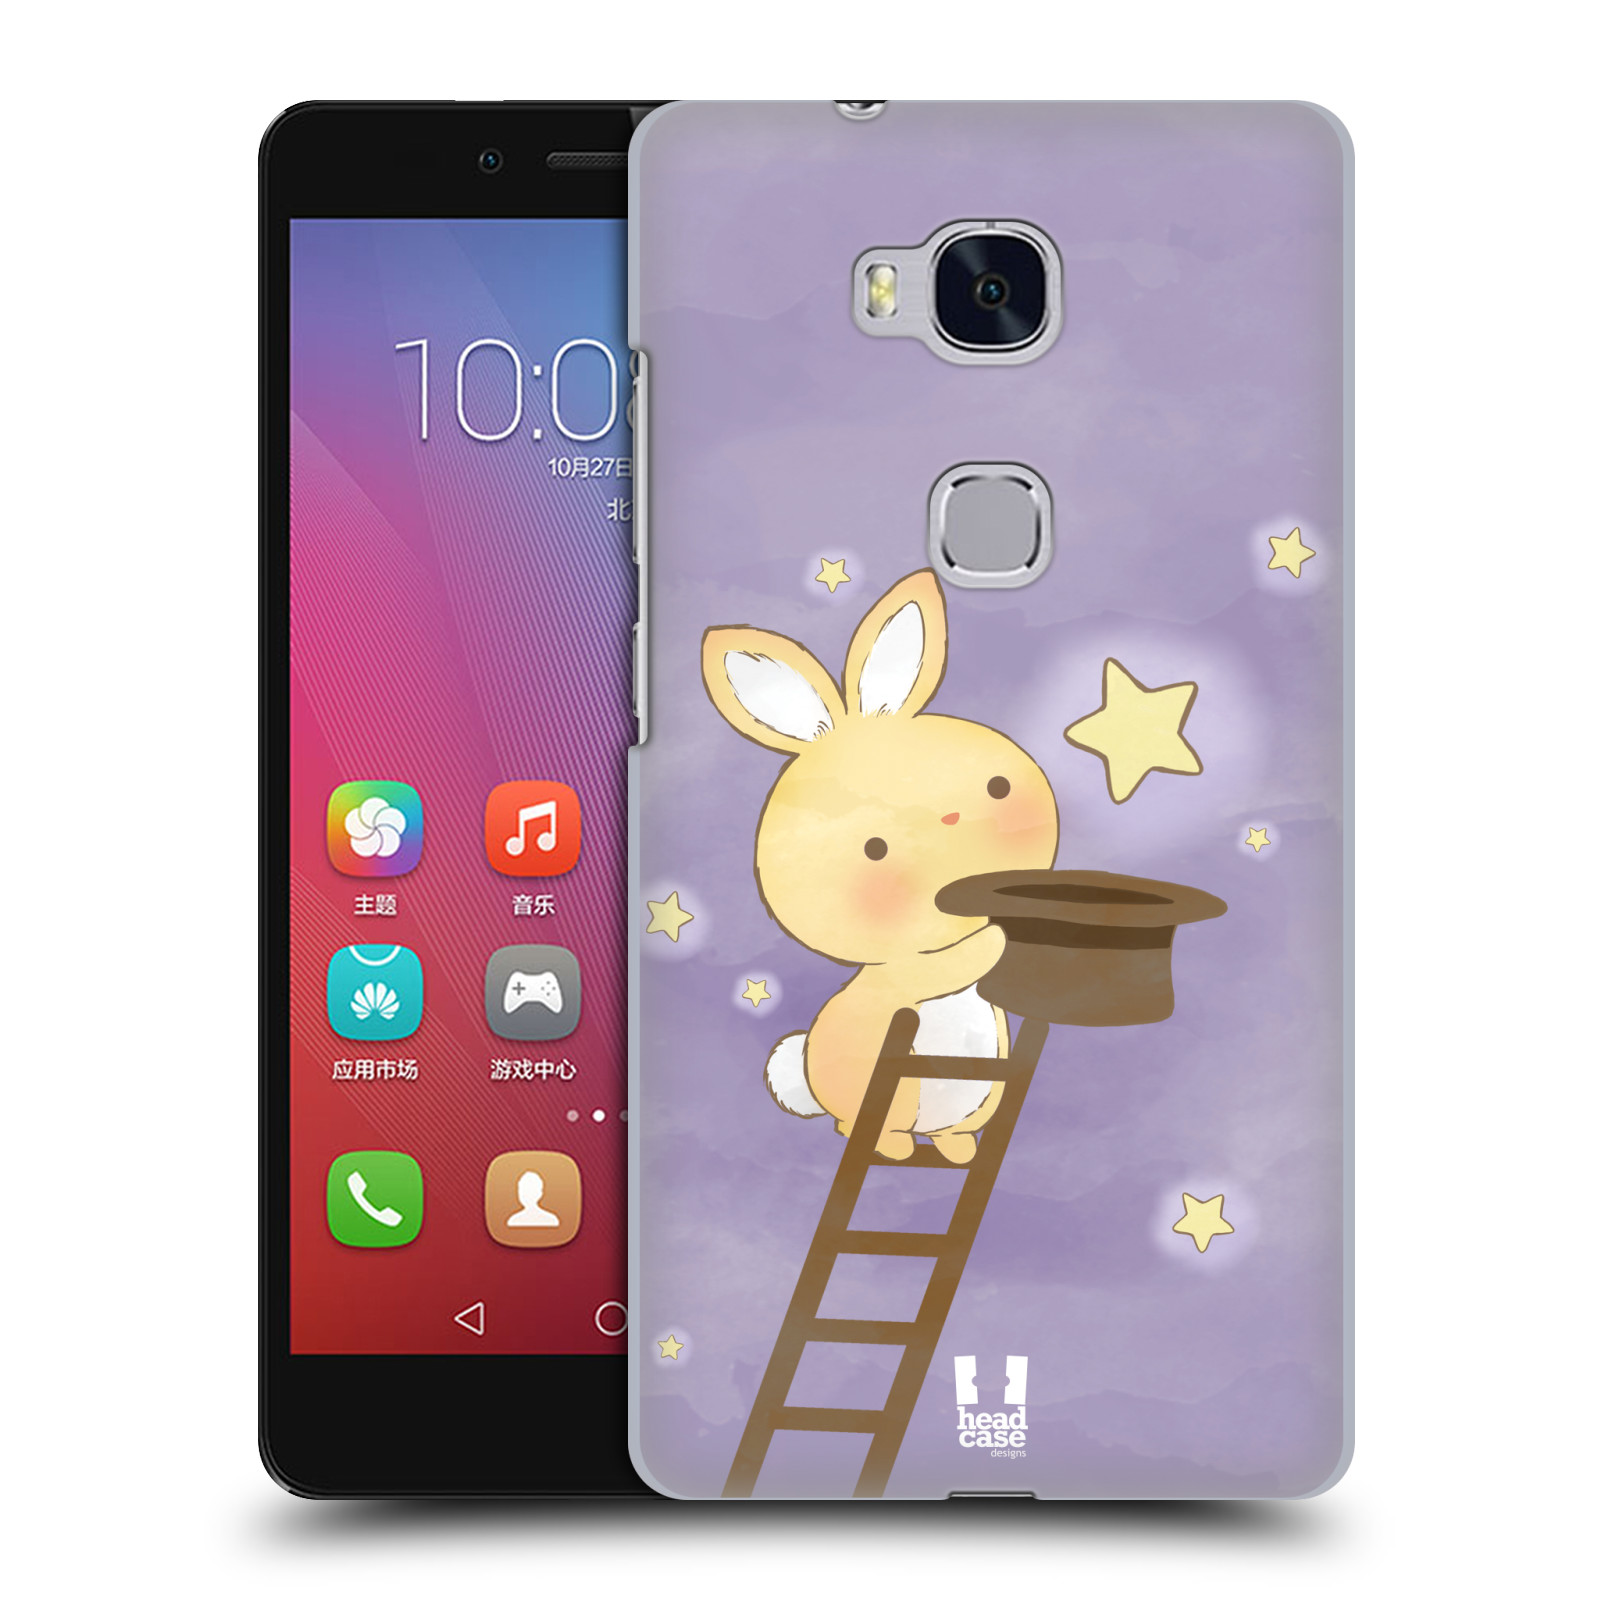 HEAD CASE pevný plastový obal na mobil HUAWEI HONOR 5X vzor králíček a hvězdy fialová